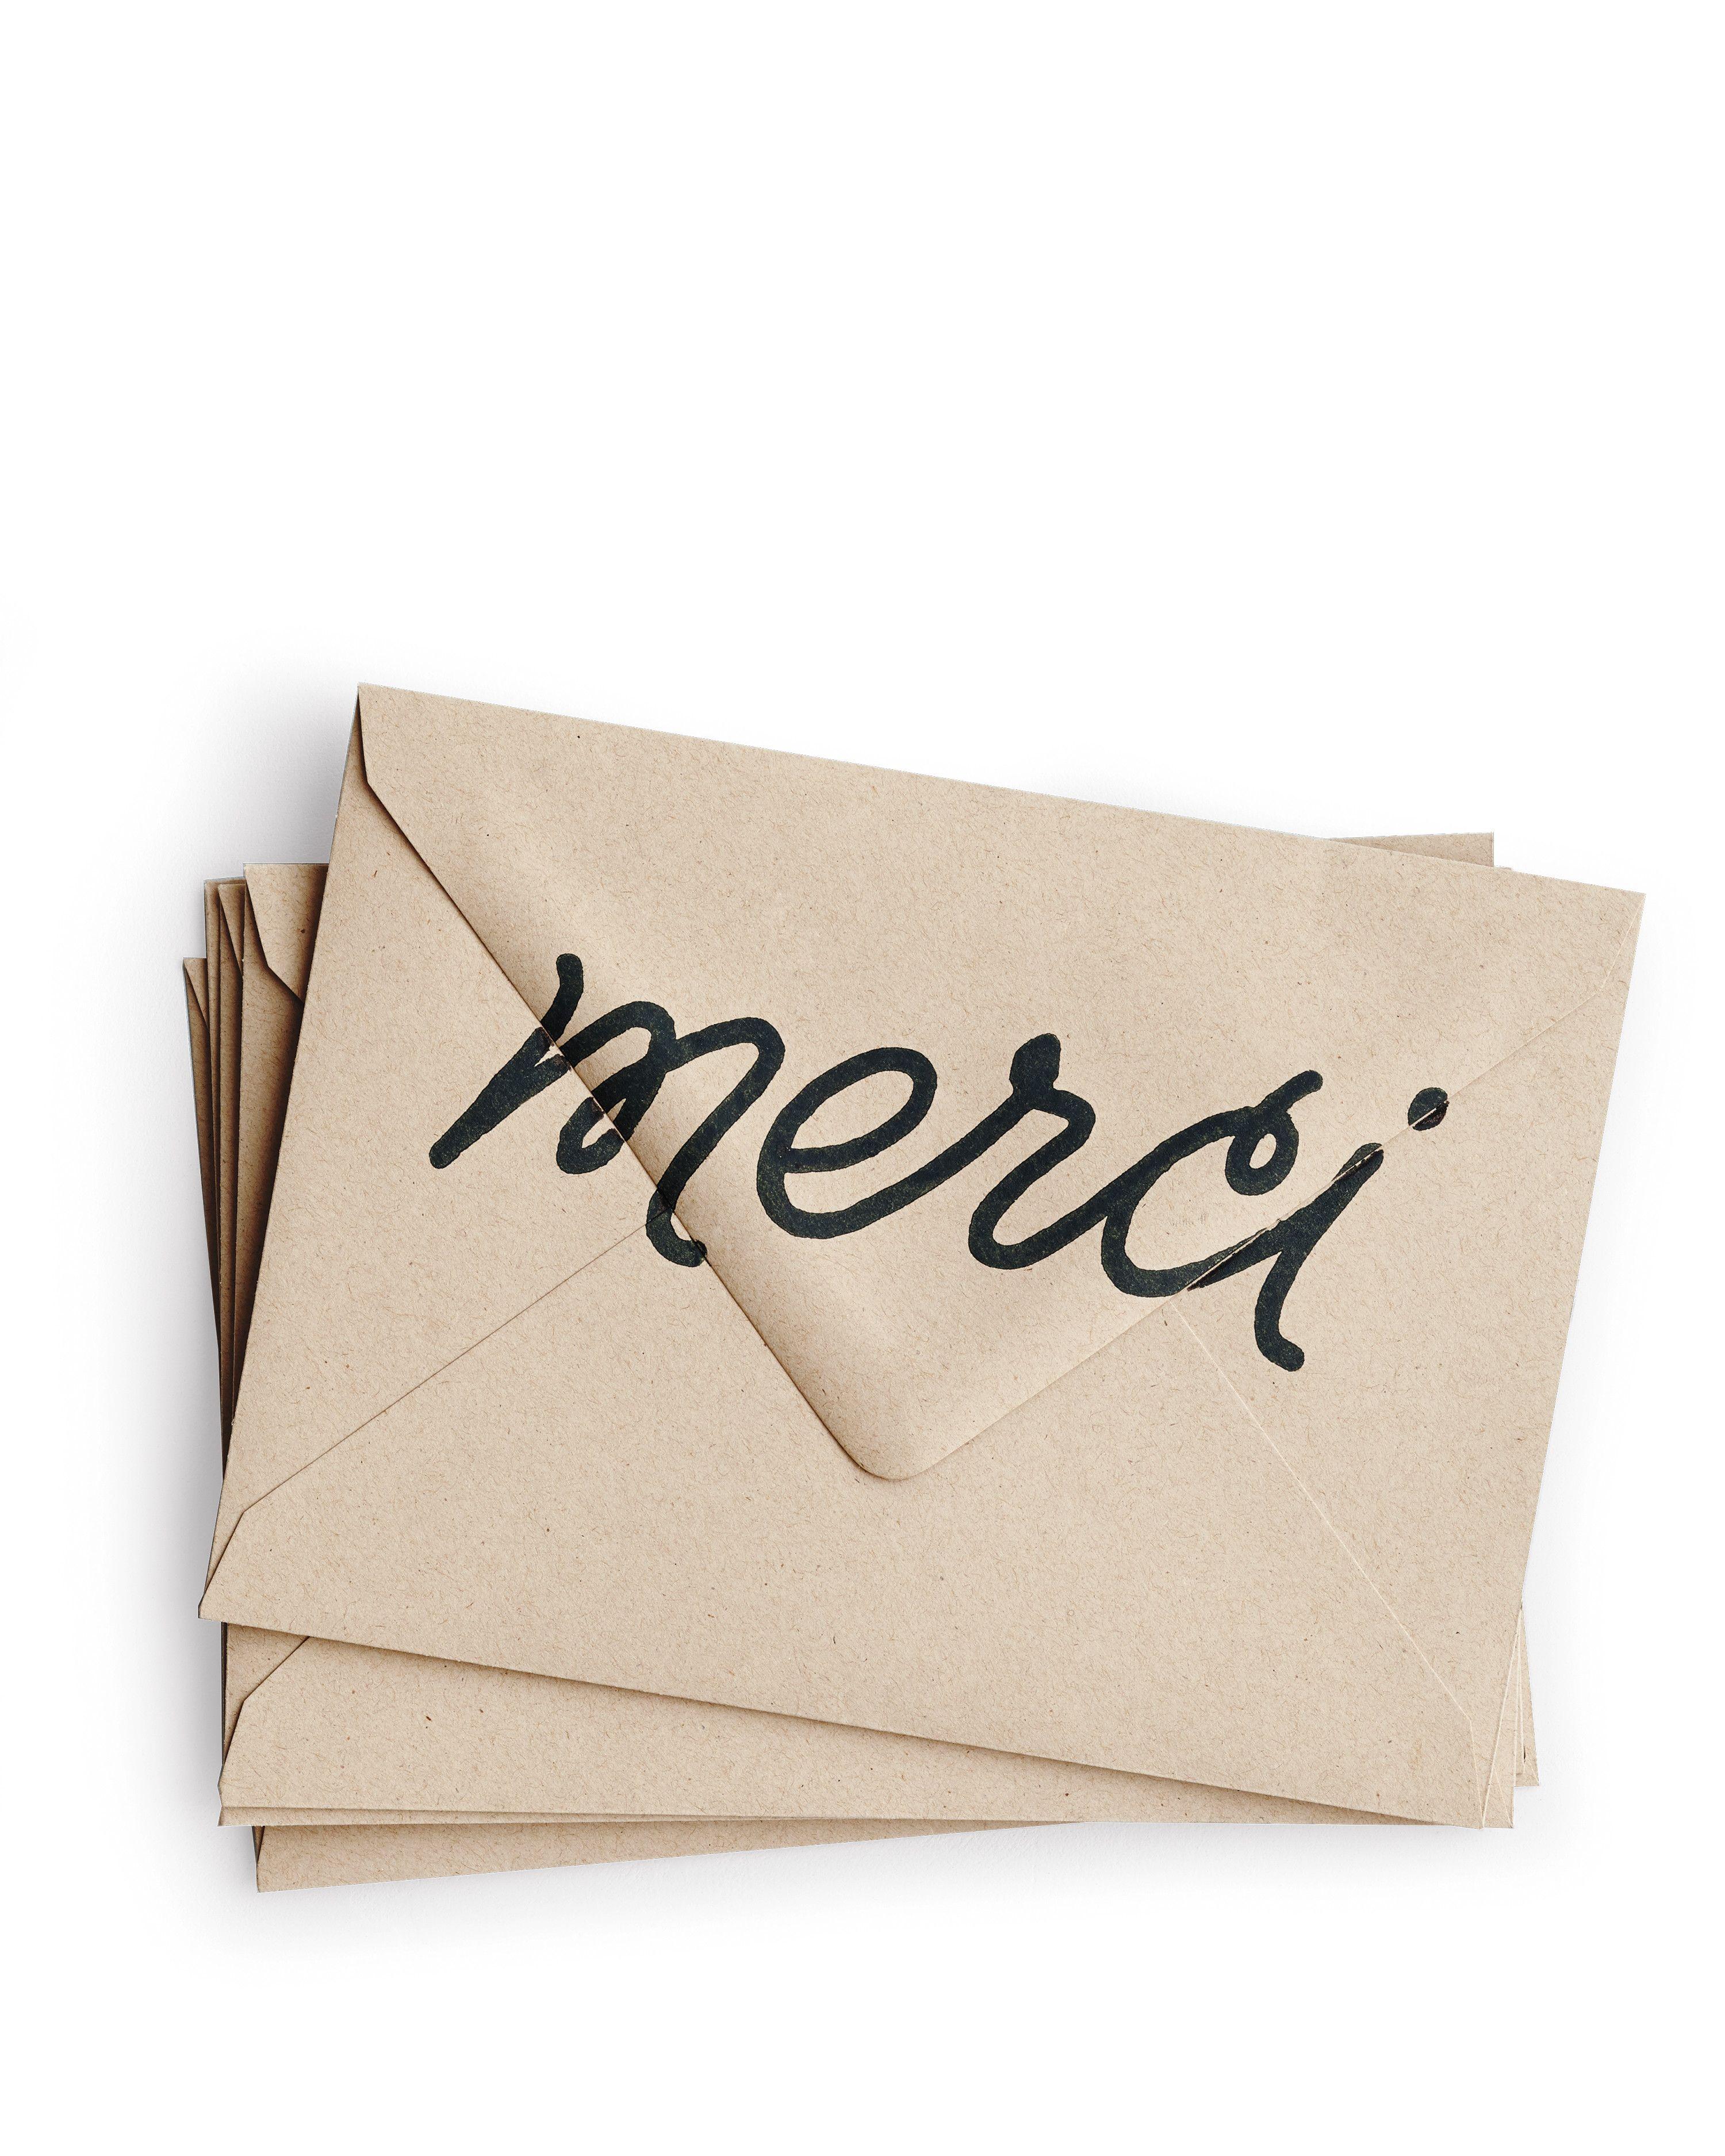 how to write a gracious bridal shower thankyou card